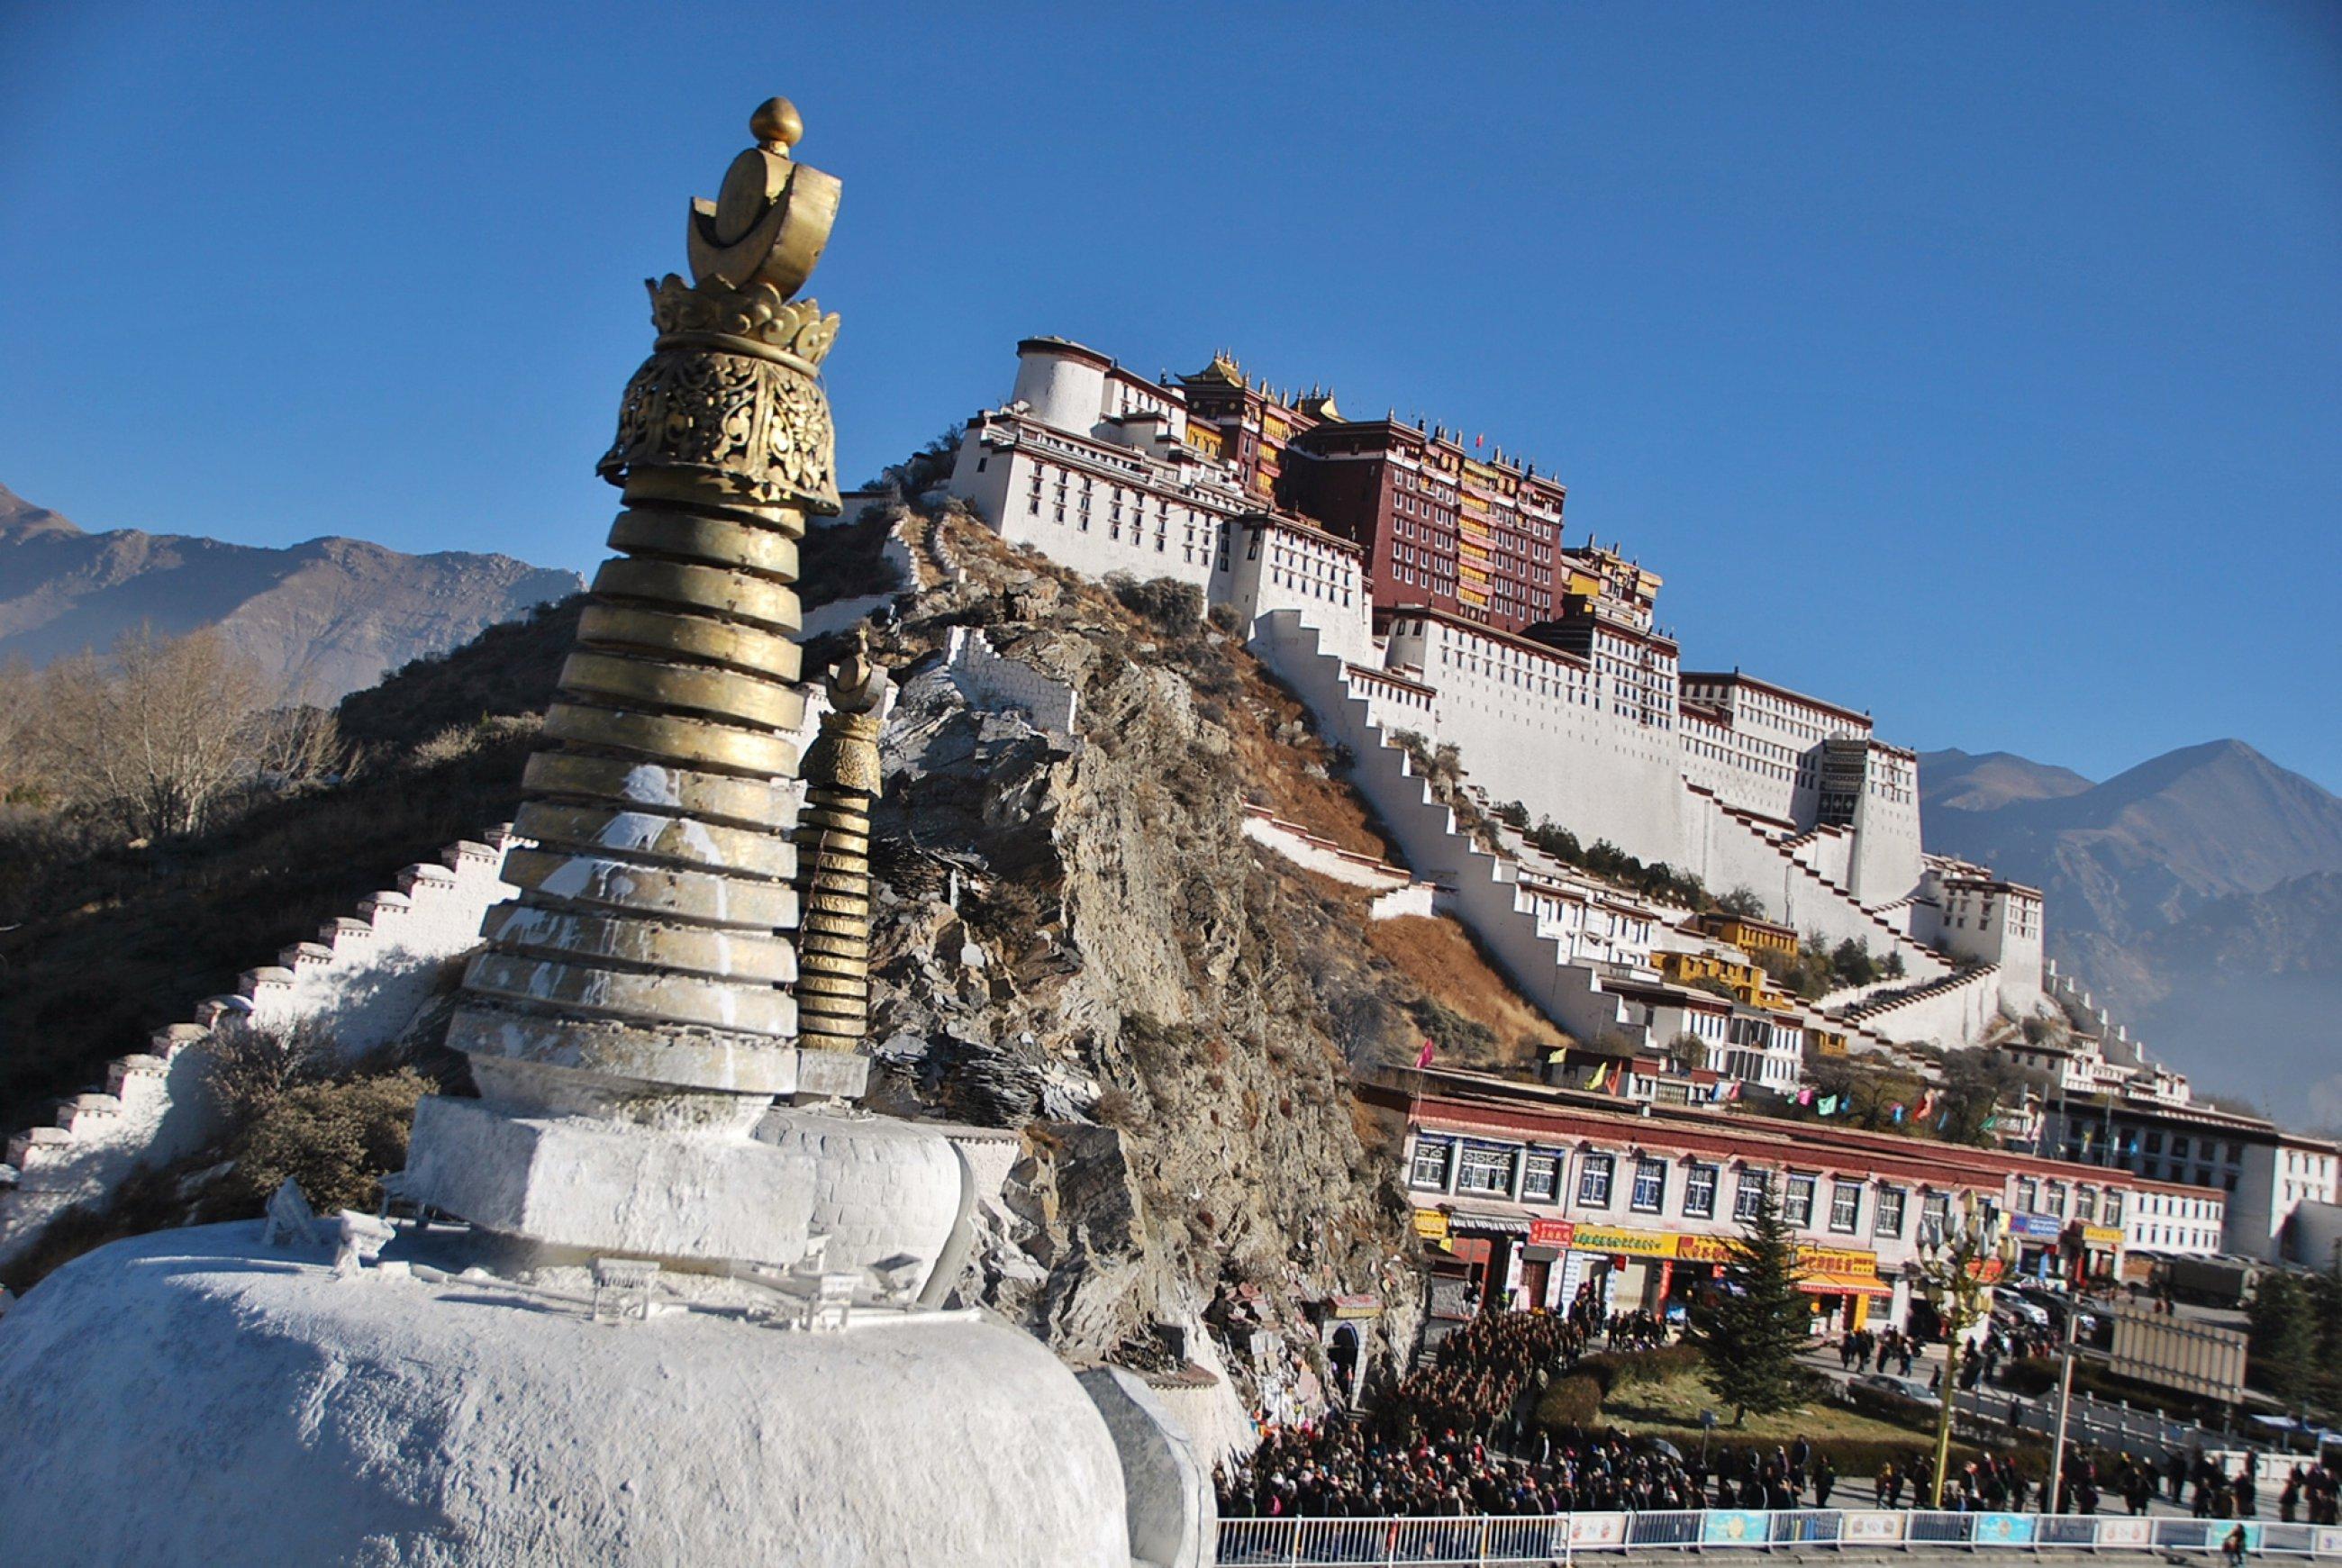 https://bubo.sk/uploads/galleries/16269/tibet-lhasa-ctni-11-2014-mirka-sulka-156-.jpg